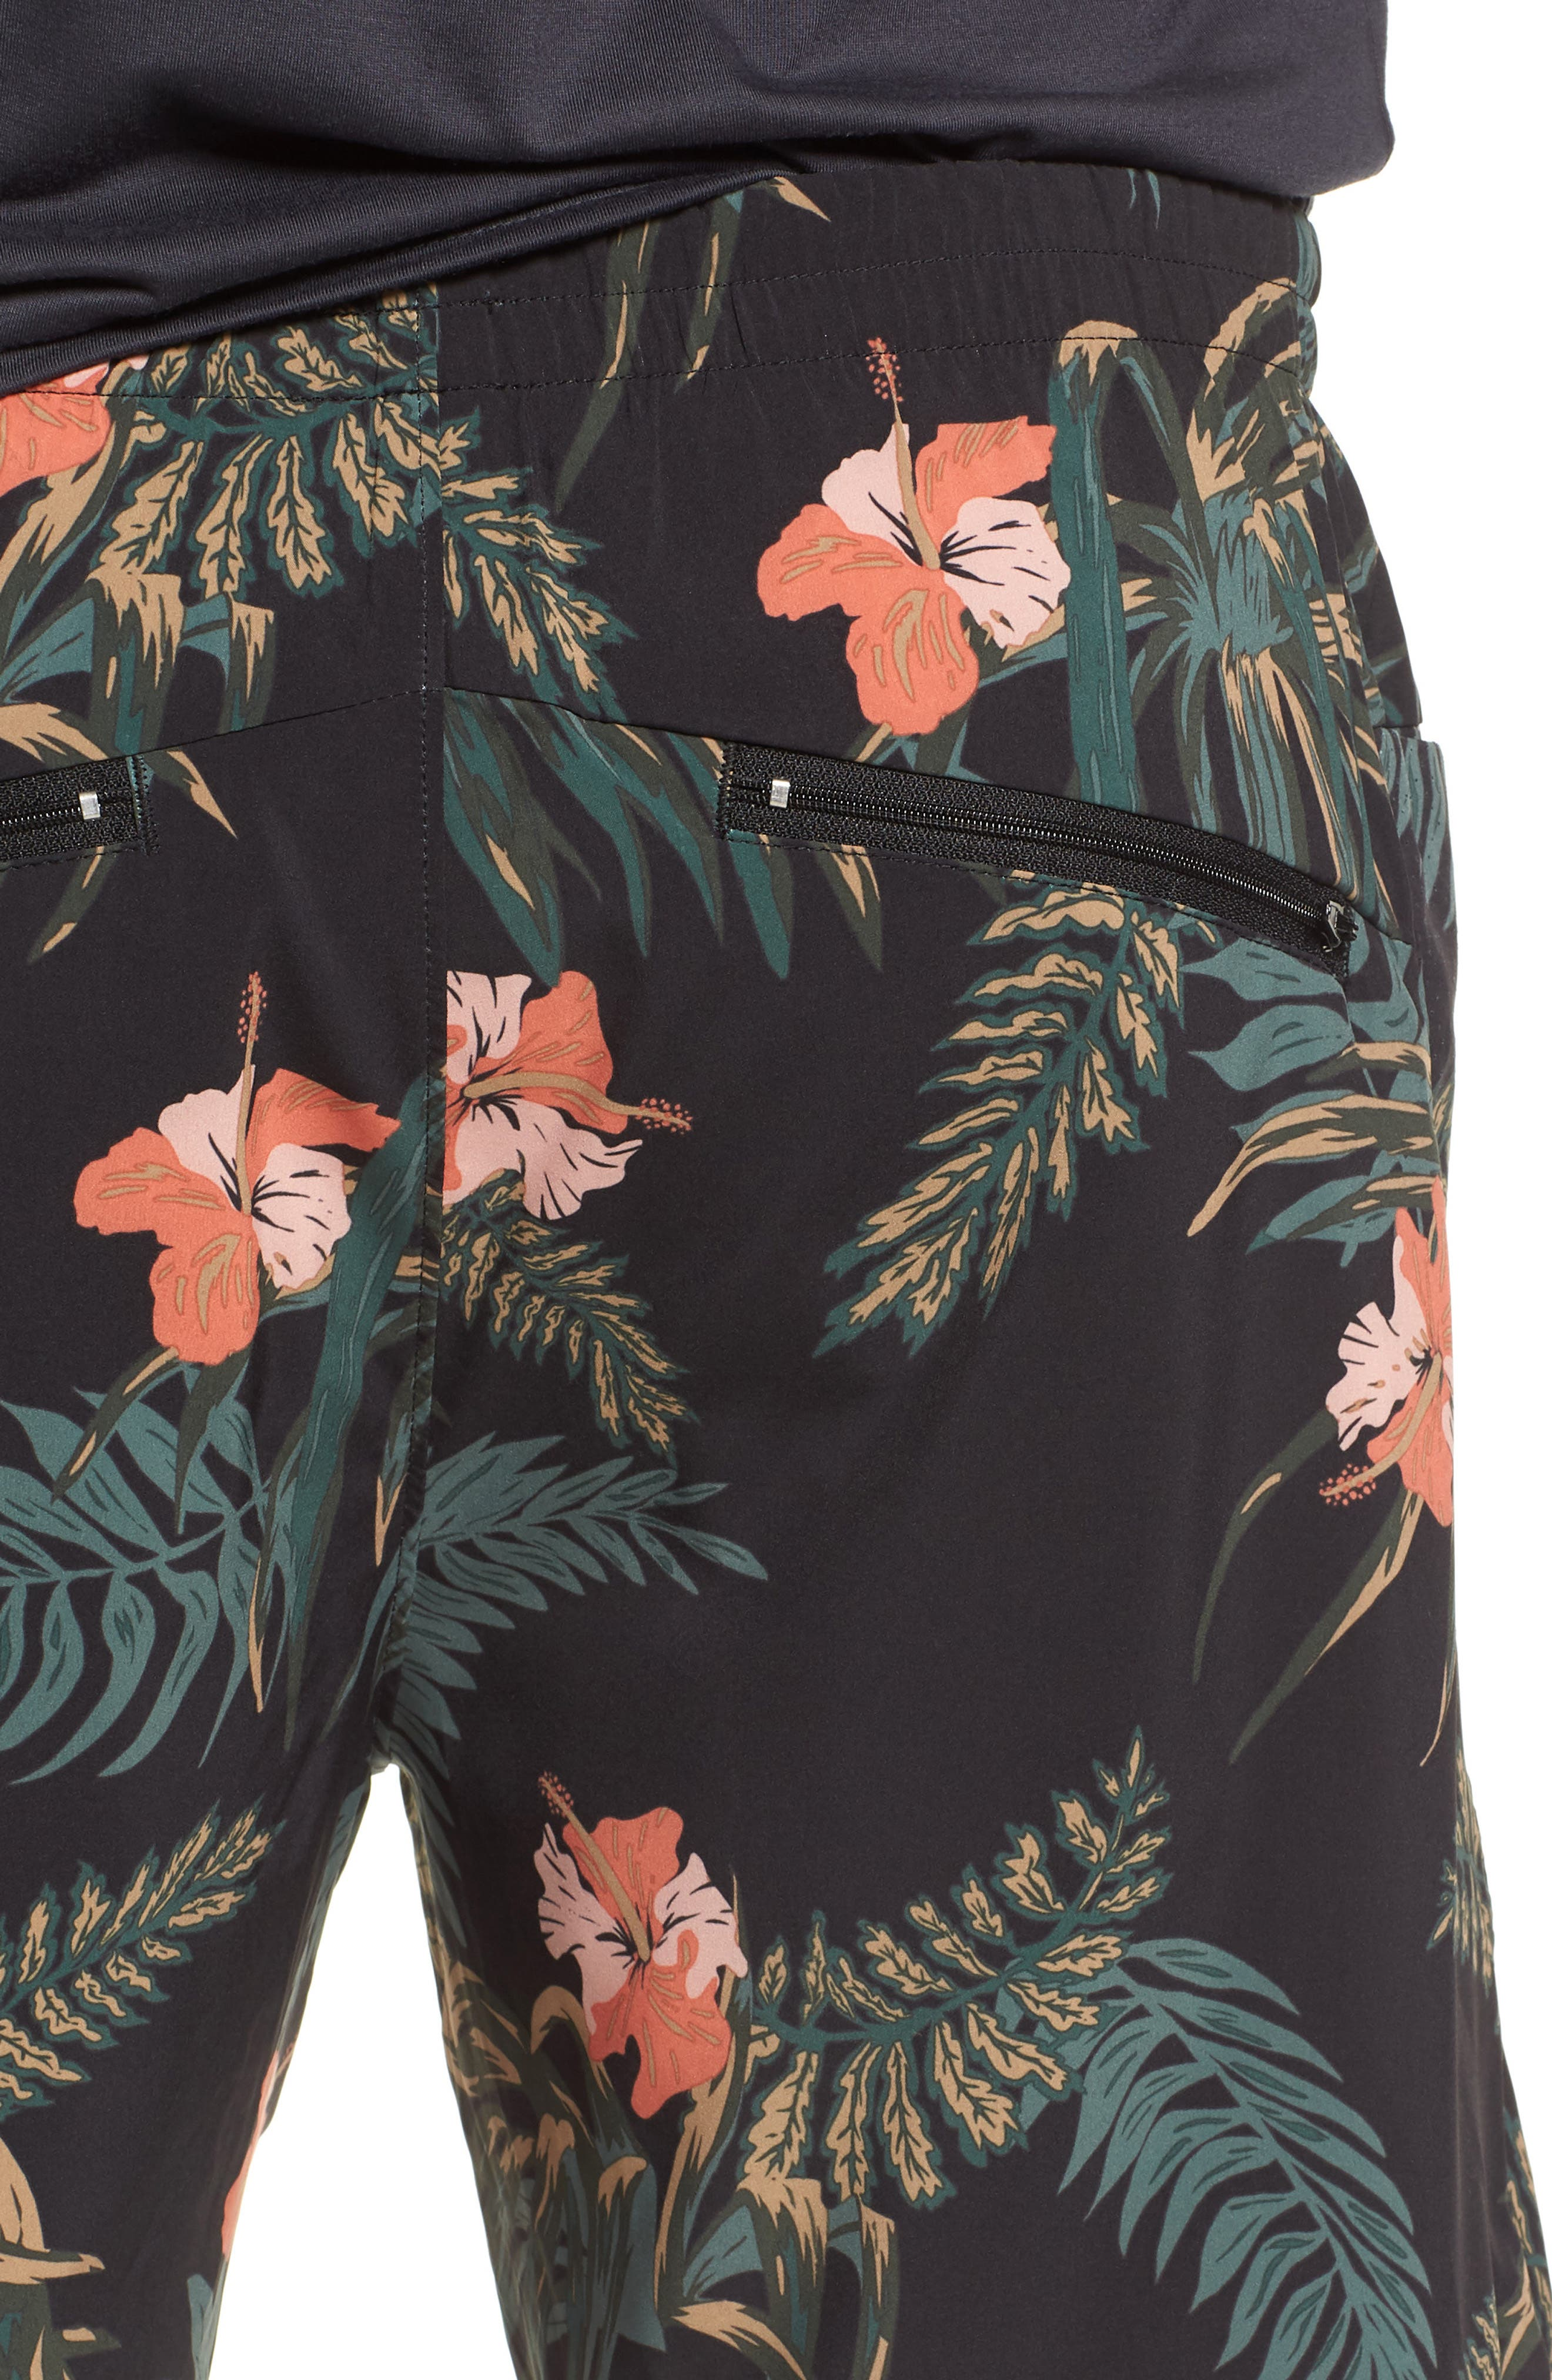 Ignite Shorts,                             Alternate thumbnail 4, color,                             Floral/ Multi